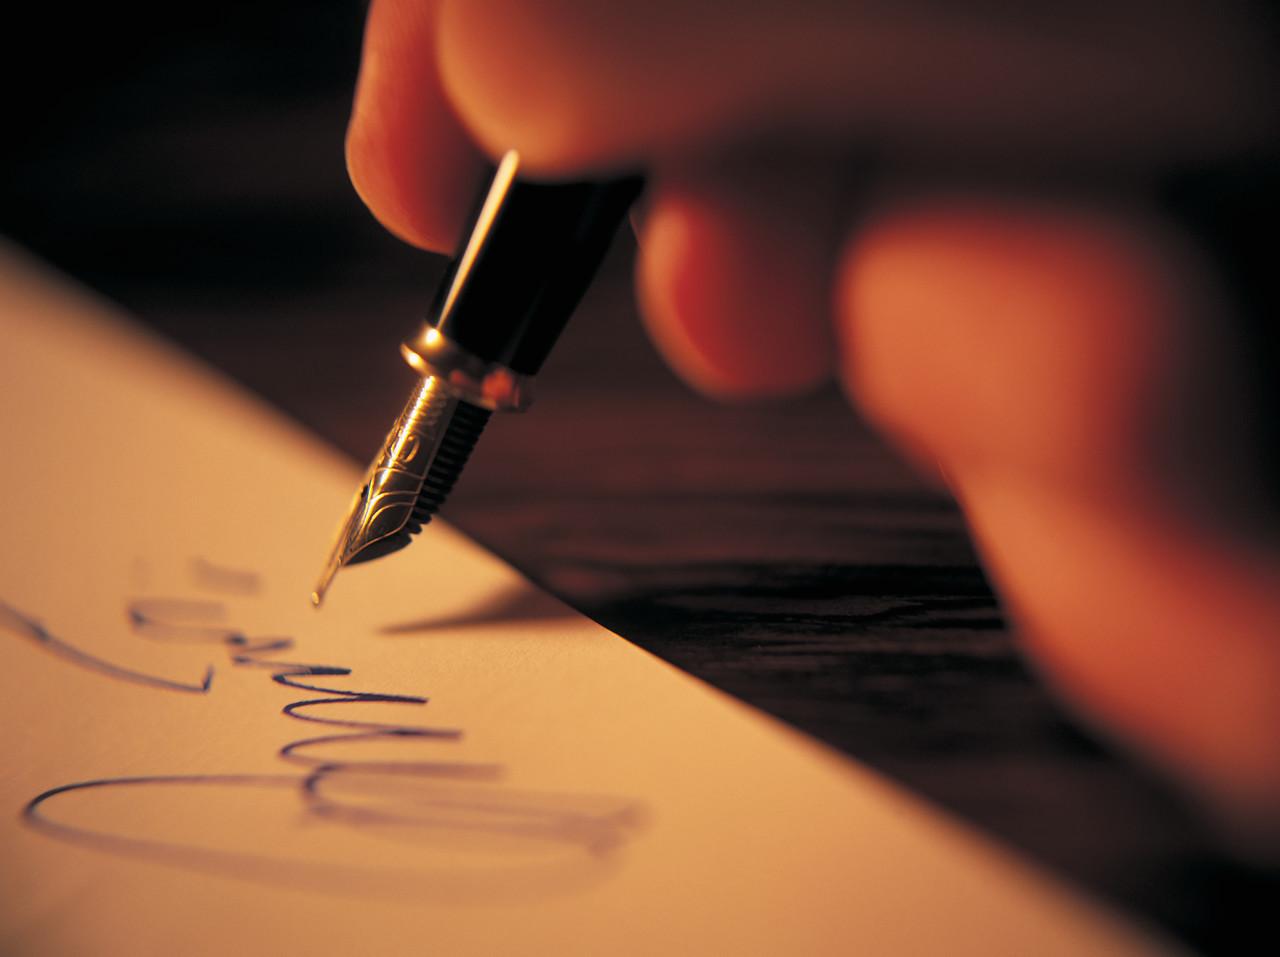 inkpenhand.jpg